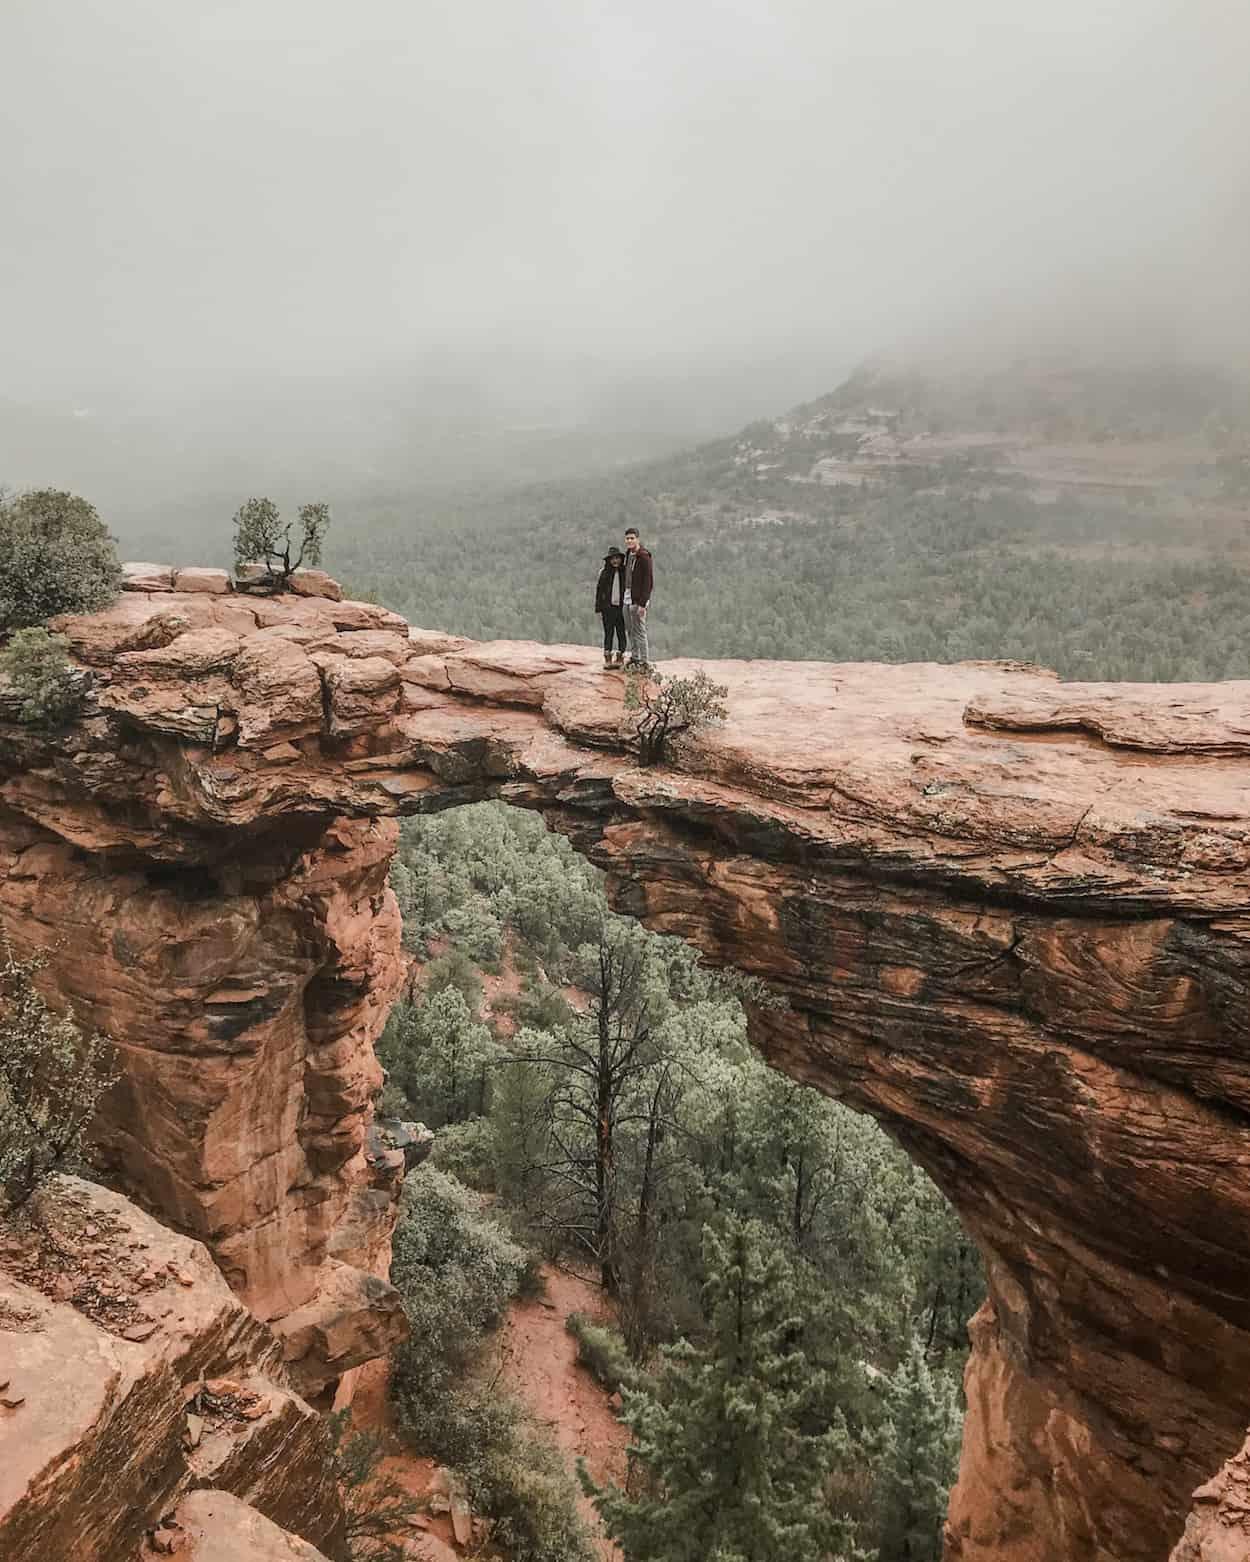 The Devil's Bridge makes for epic Instagrammable photos